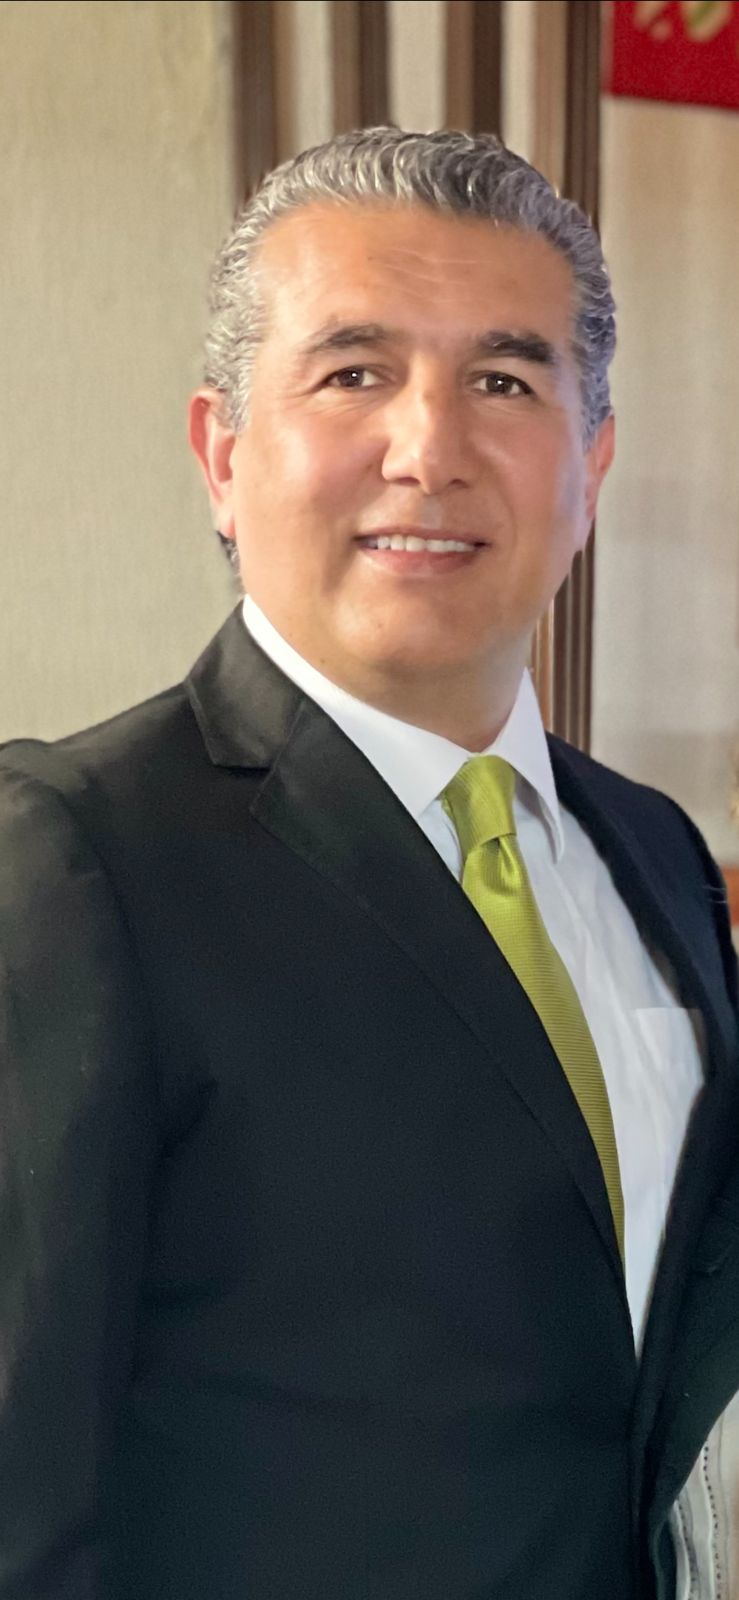 Humberto Ayala